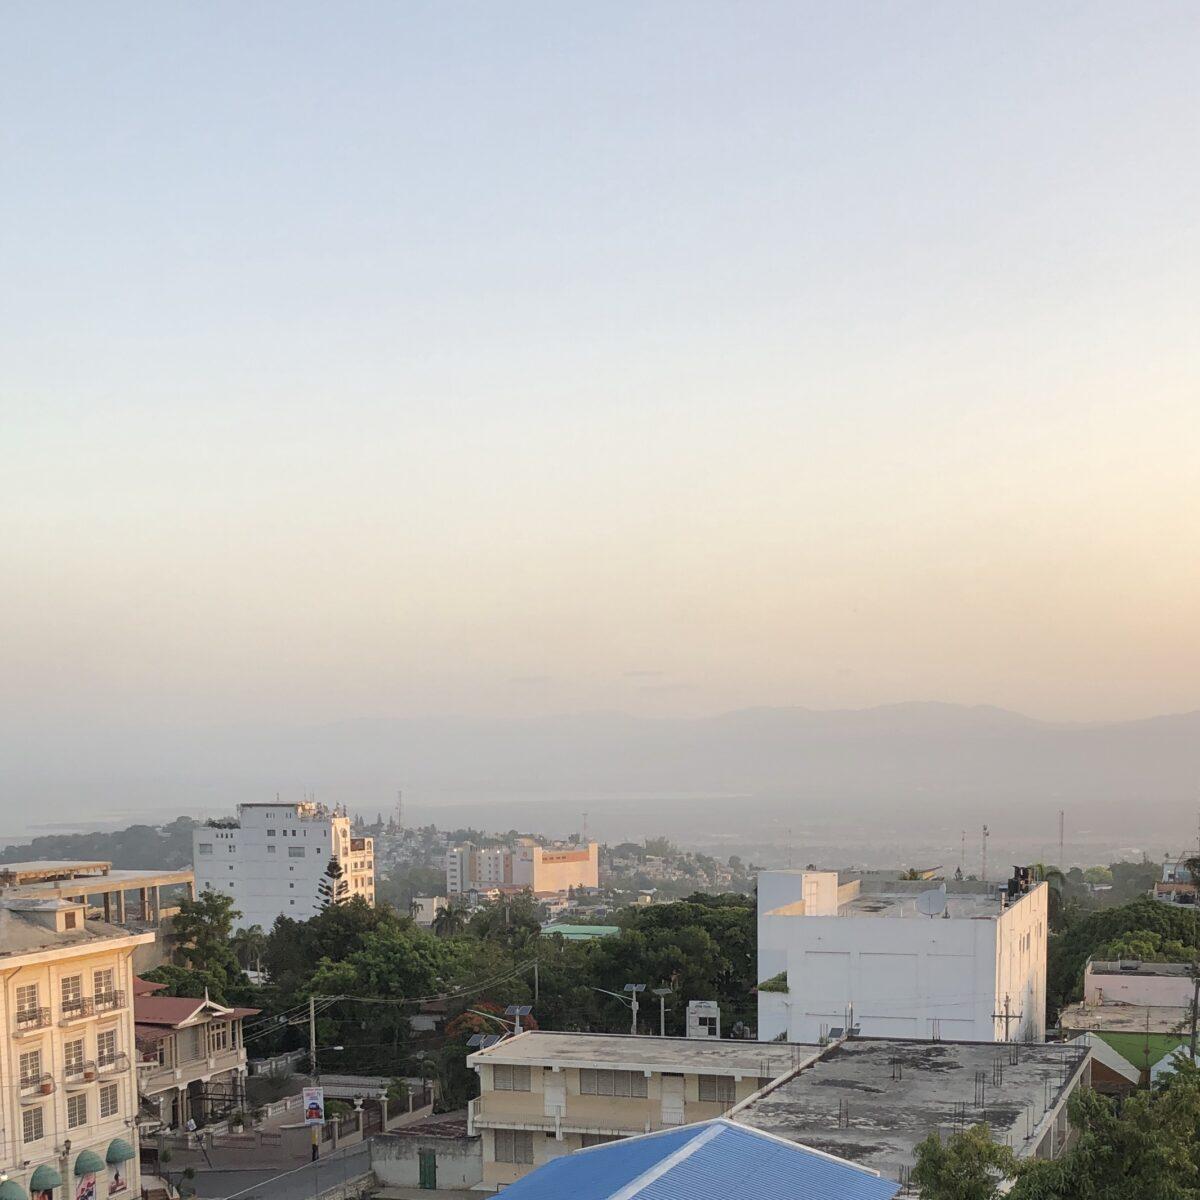 Rooftops in Haiti